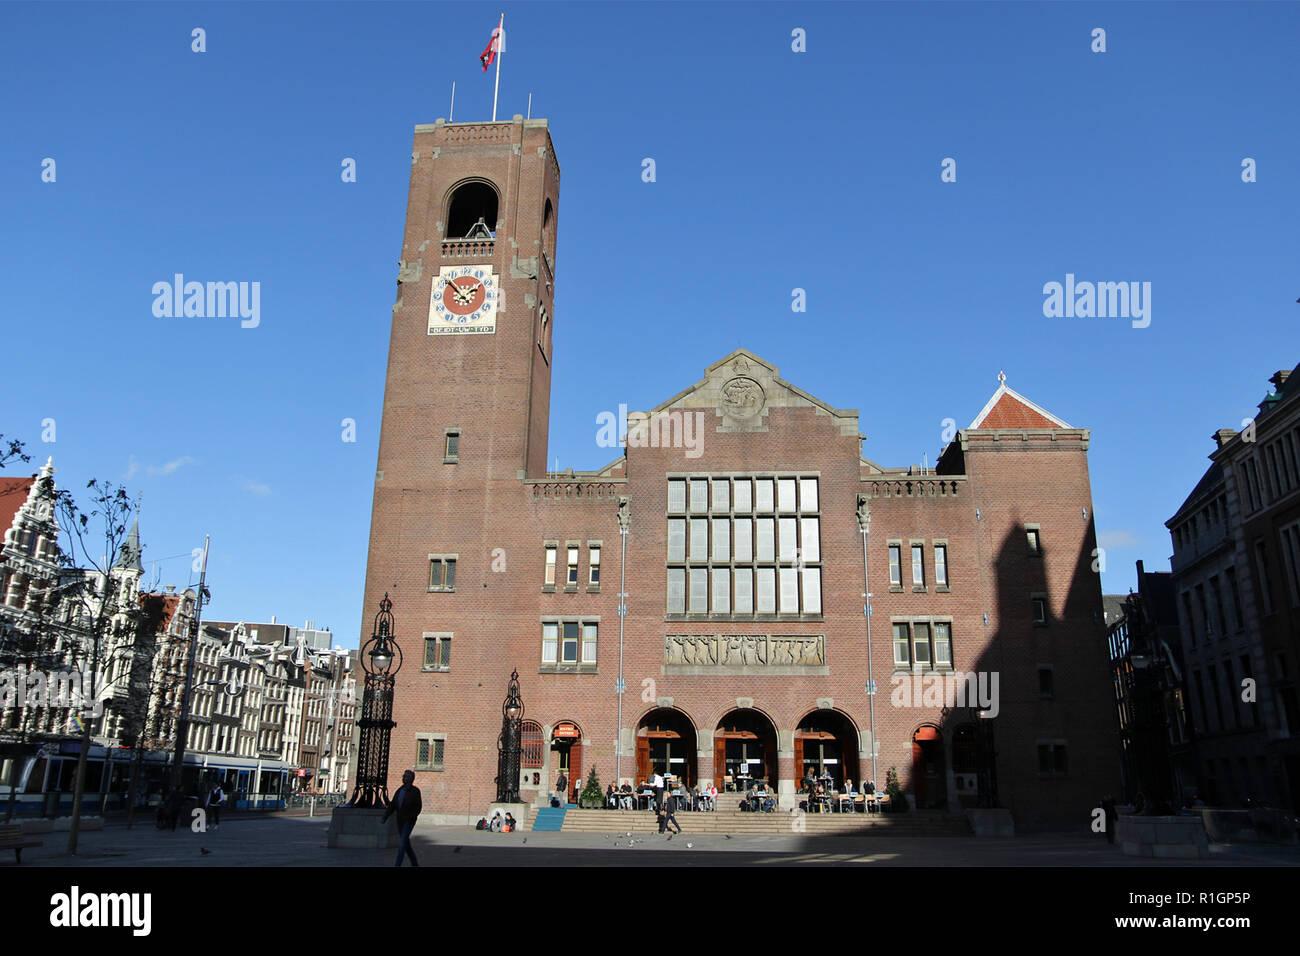 Stock Photosamp; Exchange Amsterdam Amsterdam Building PZuOkXi